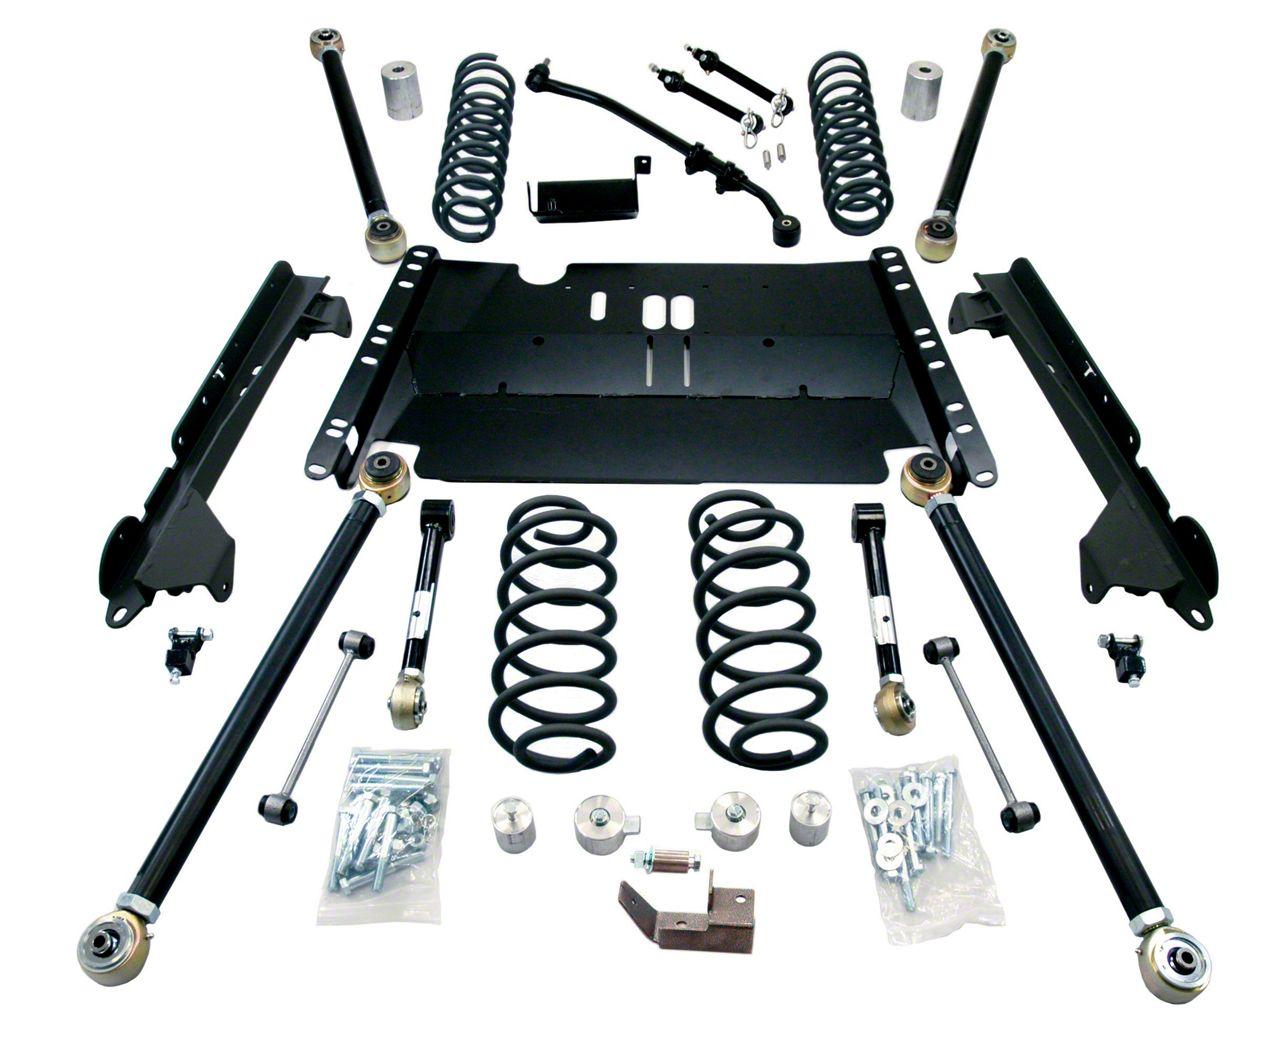 Teraflex 3 in. Enduro LCG Long FlexArm Lift Kit (97-06 Jeep Wrangler TJ)